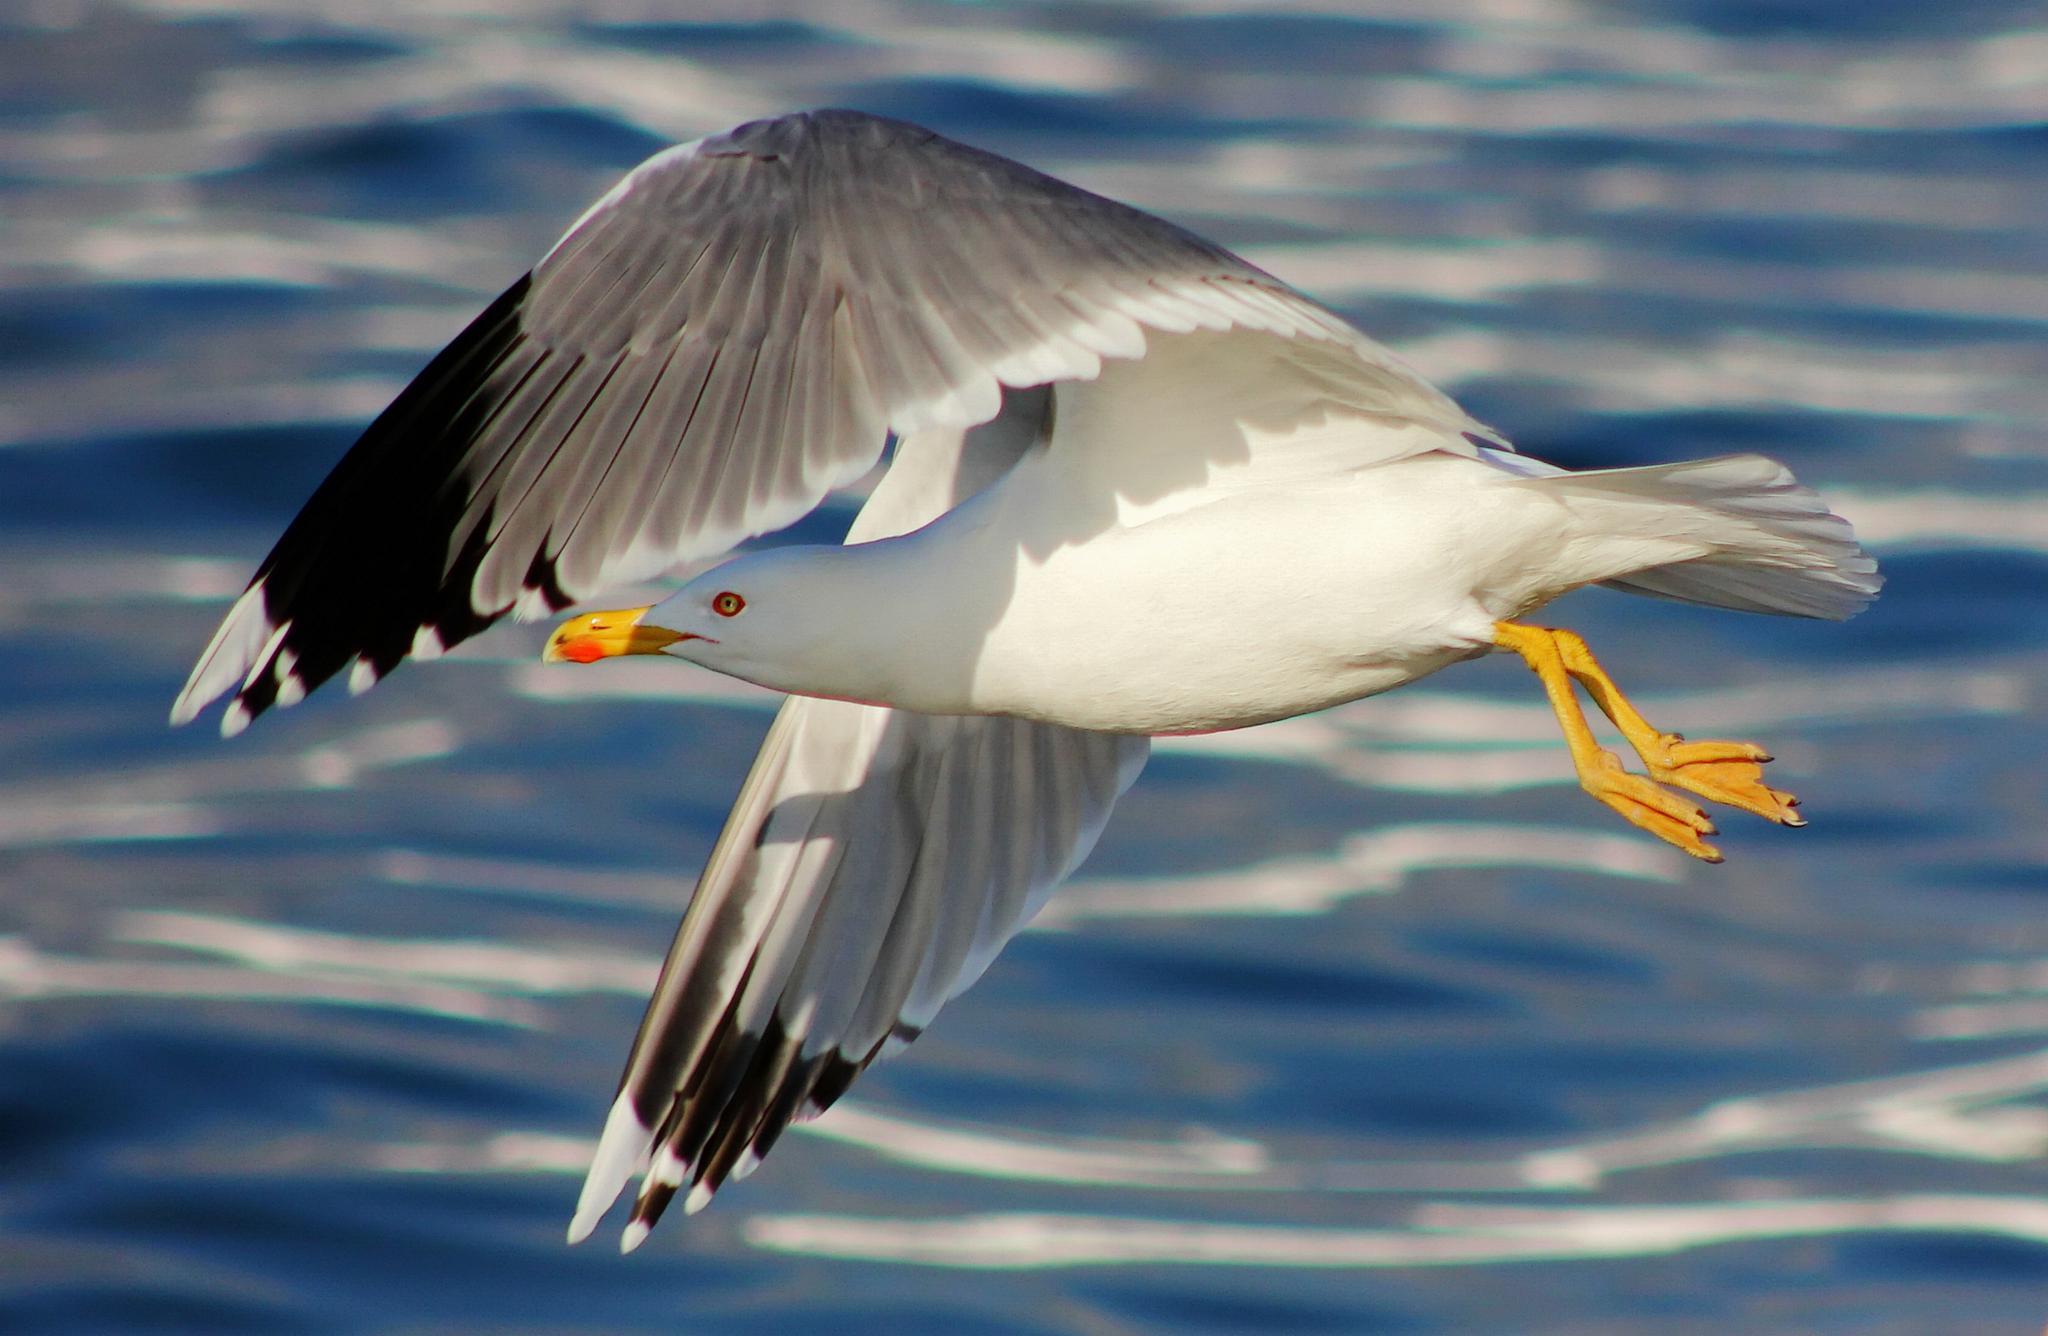 seagull by Kristijan Siladic